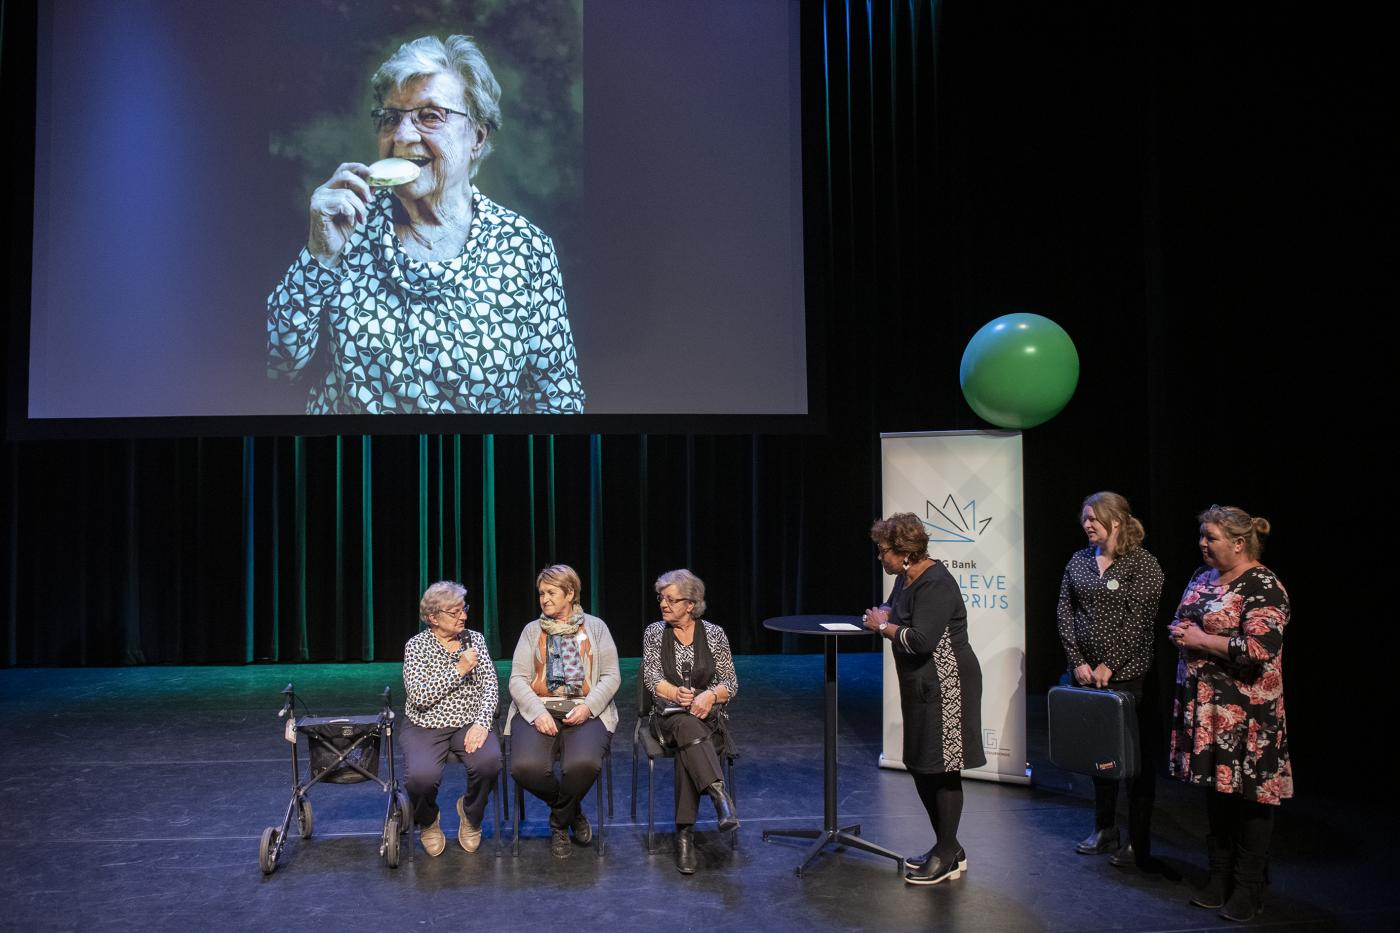 Noraly Beyer in gesprek met deelnemers van het project Helmond in honderd stukses